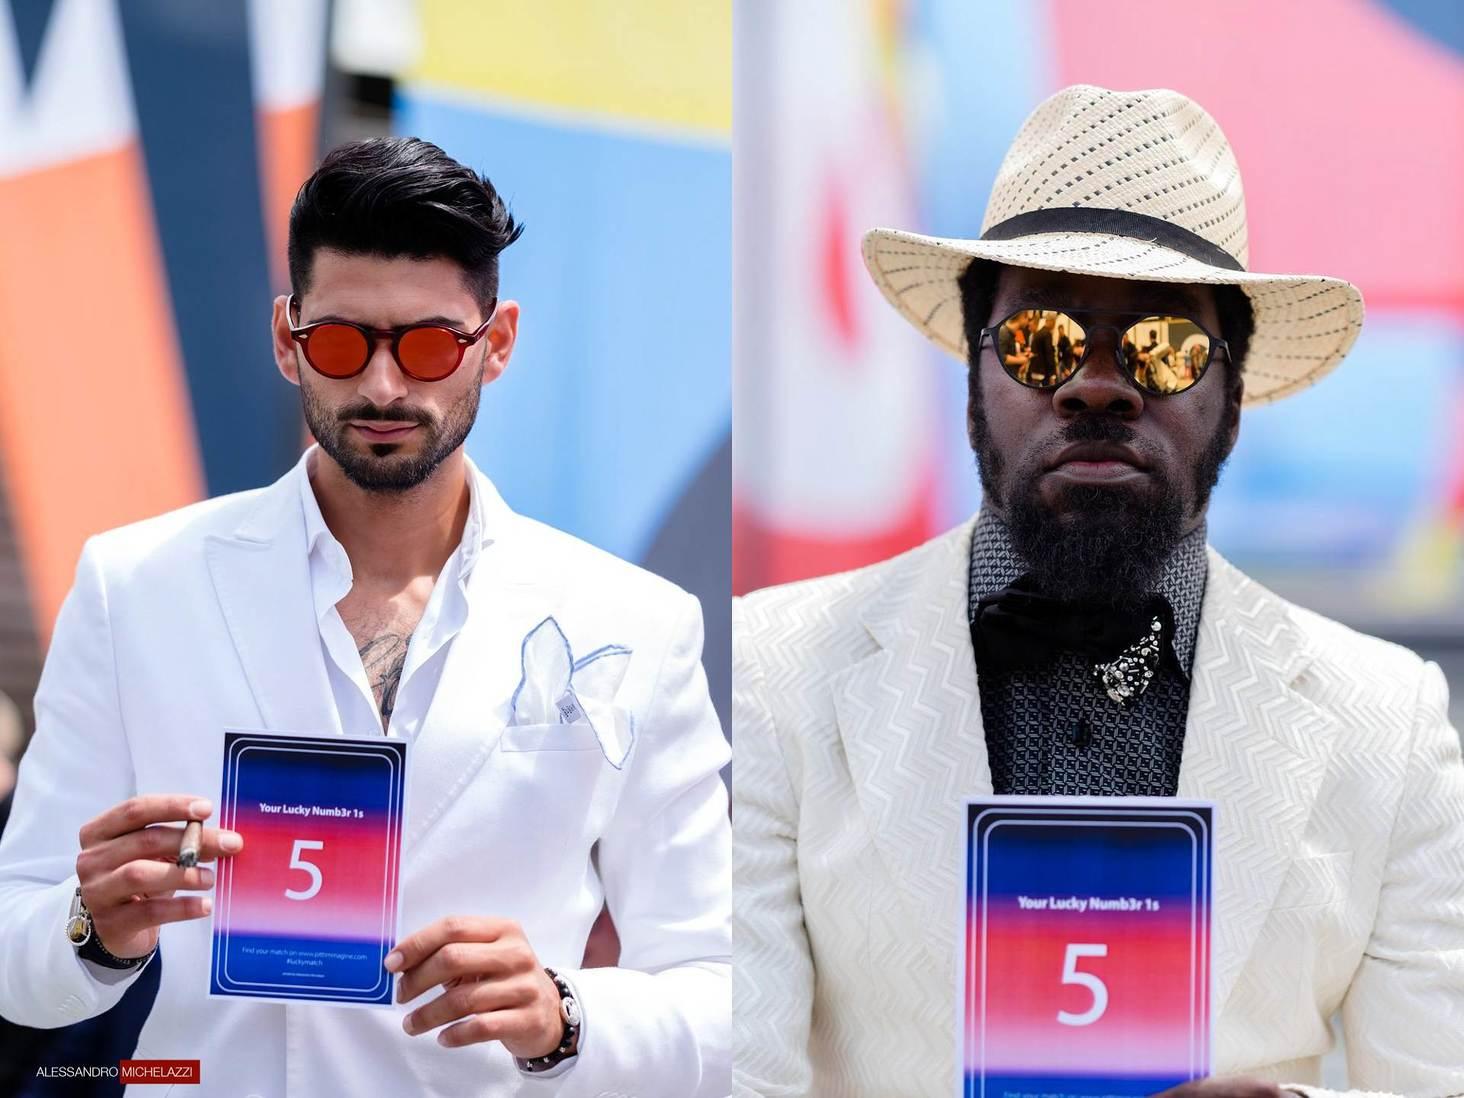 Lucky-Match-90-Pitti-Uomo-Firenze-1